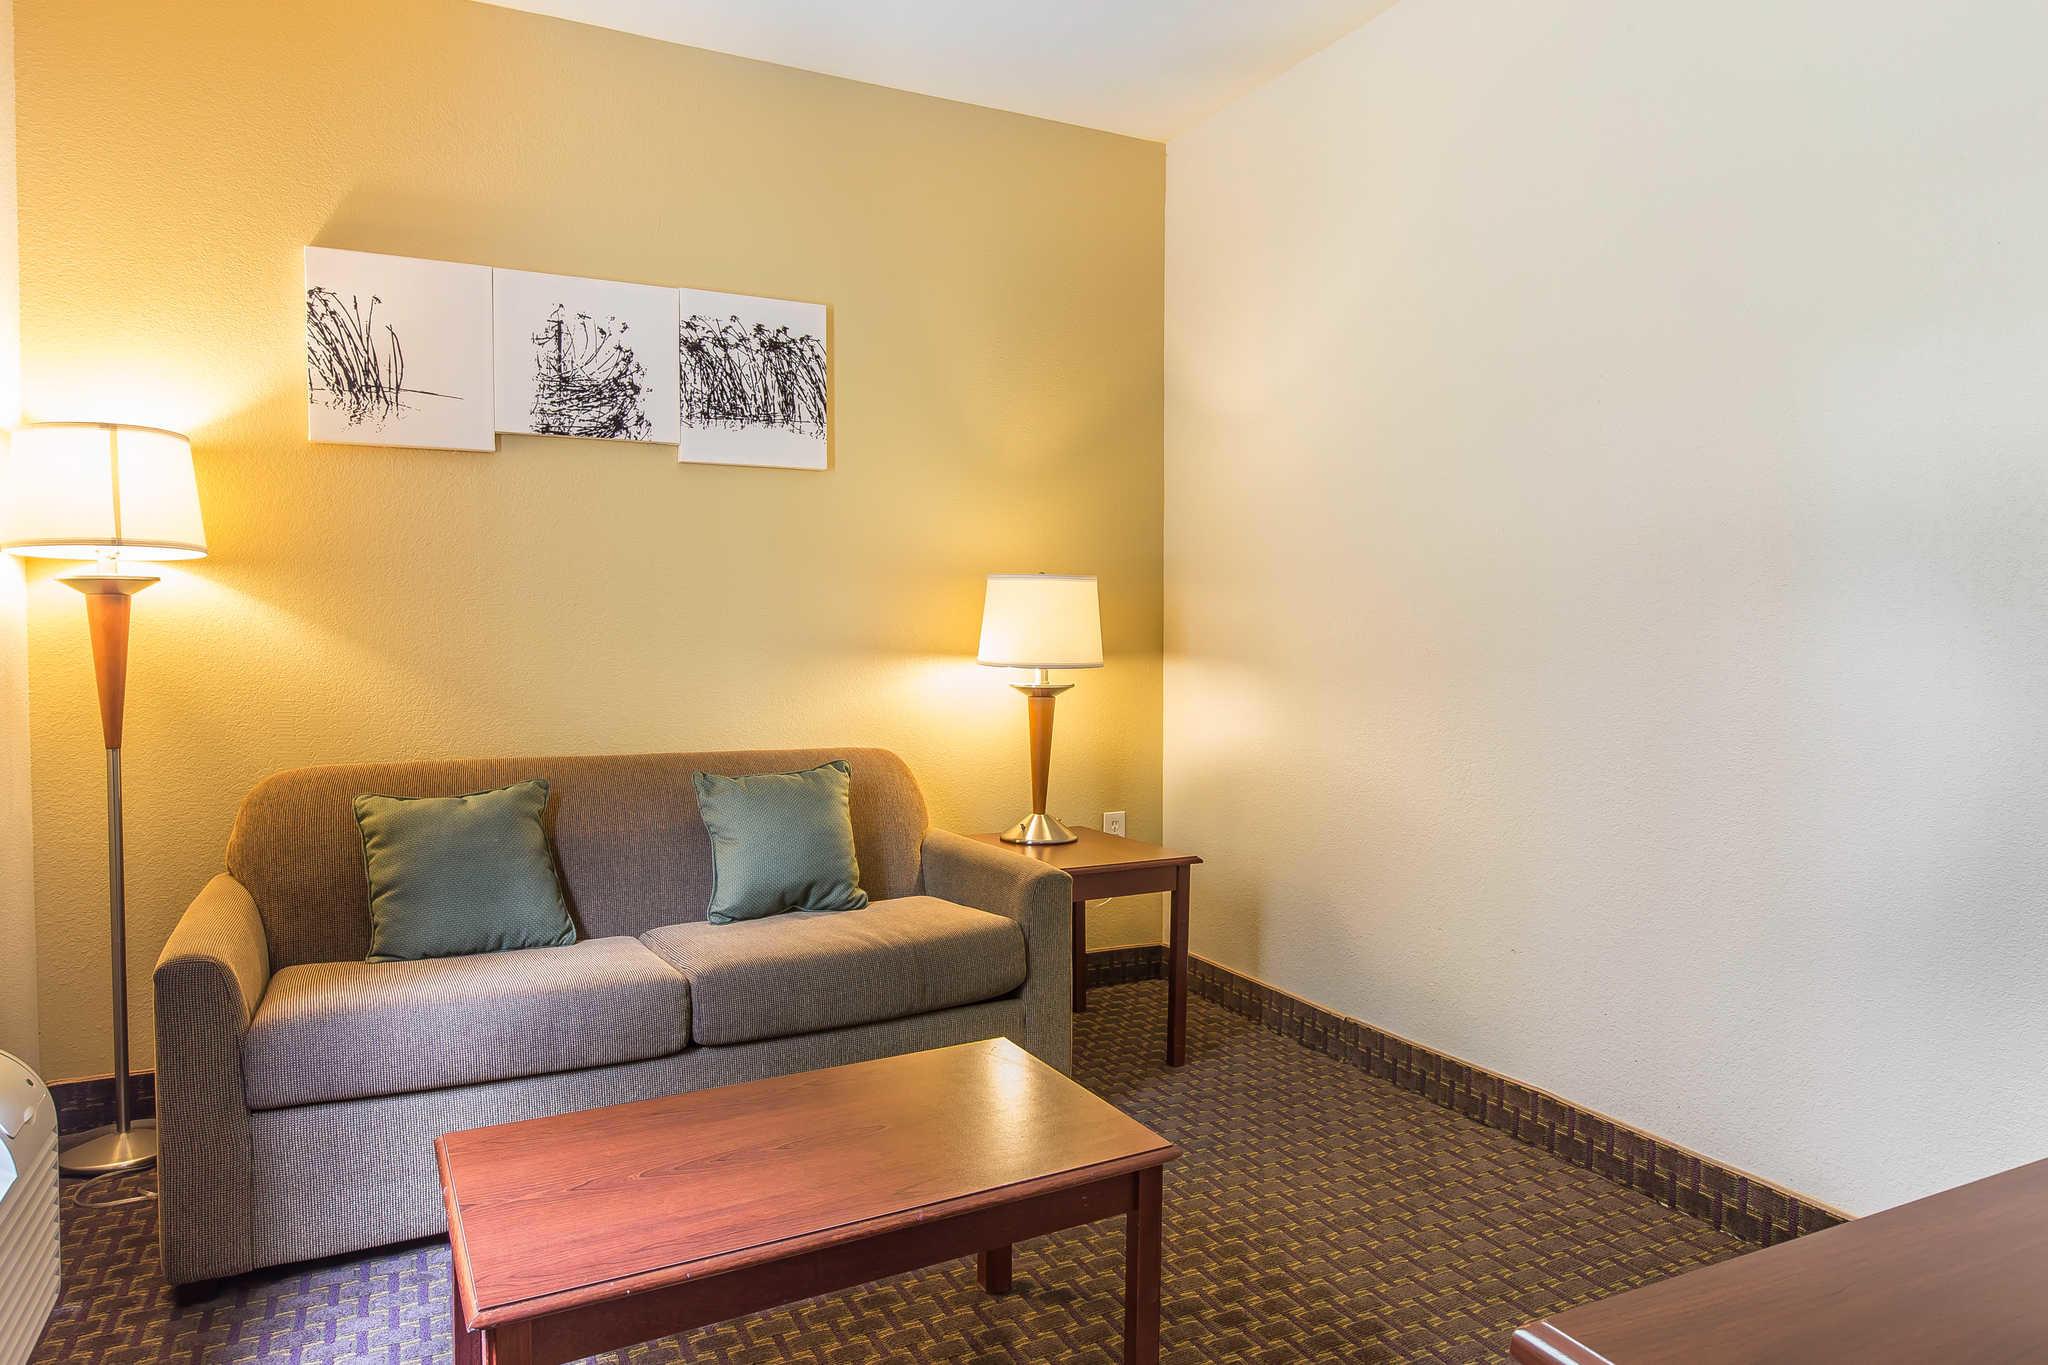 Sleep Inn & Suites At Kennesaw State University image 19